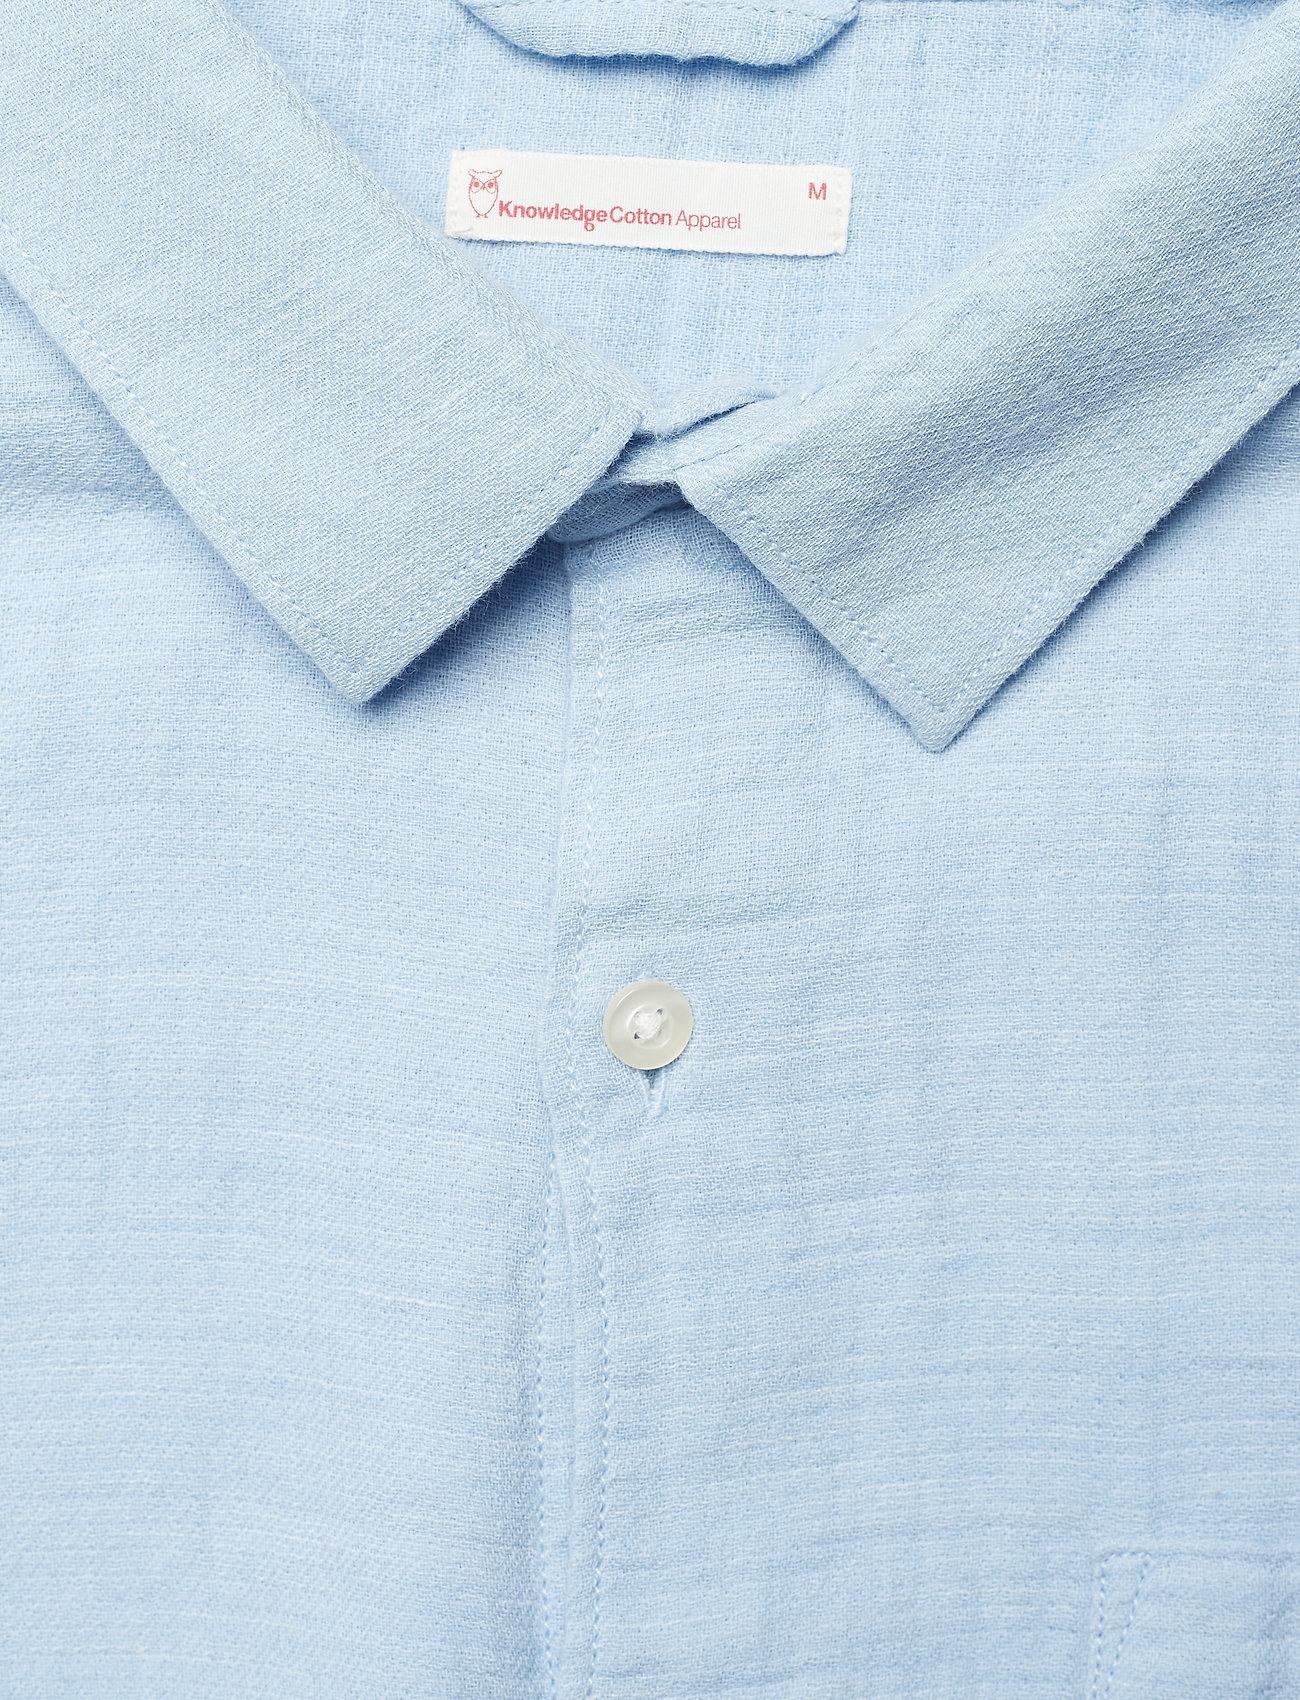 Double Cotton ShirtGotsskywayKnowledge Apparel Cotton Layer Apparel ShirtGotsskywayKnowledge Layer Double Double Layer VUzqMpS